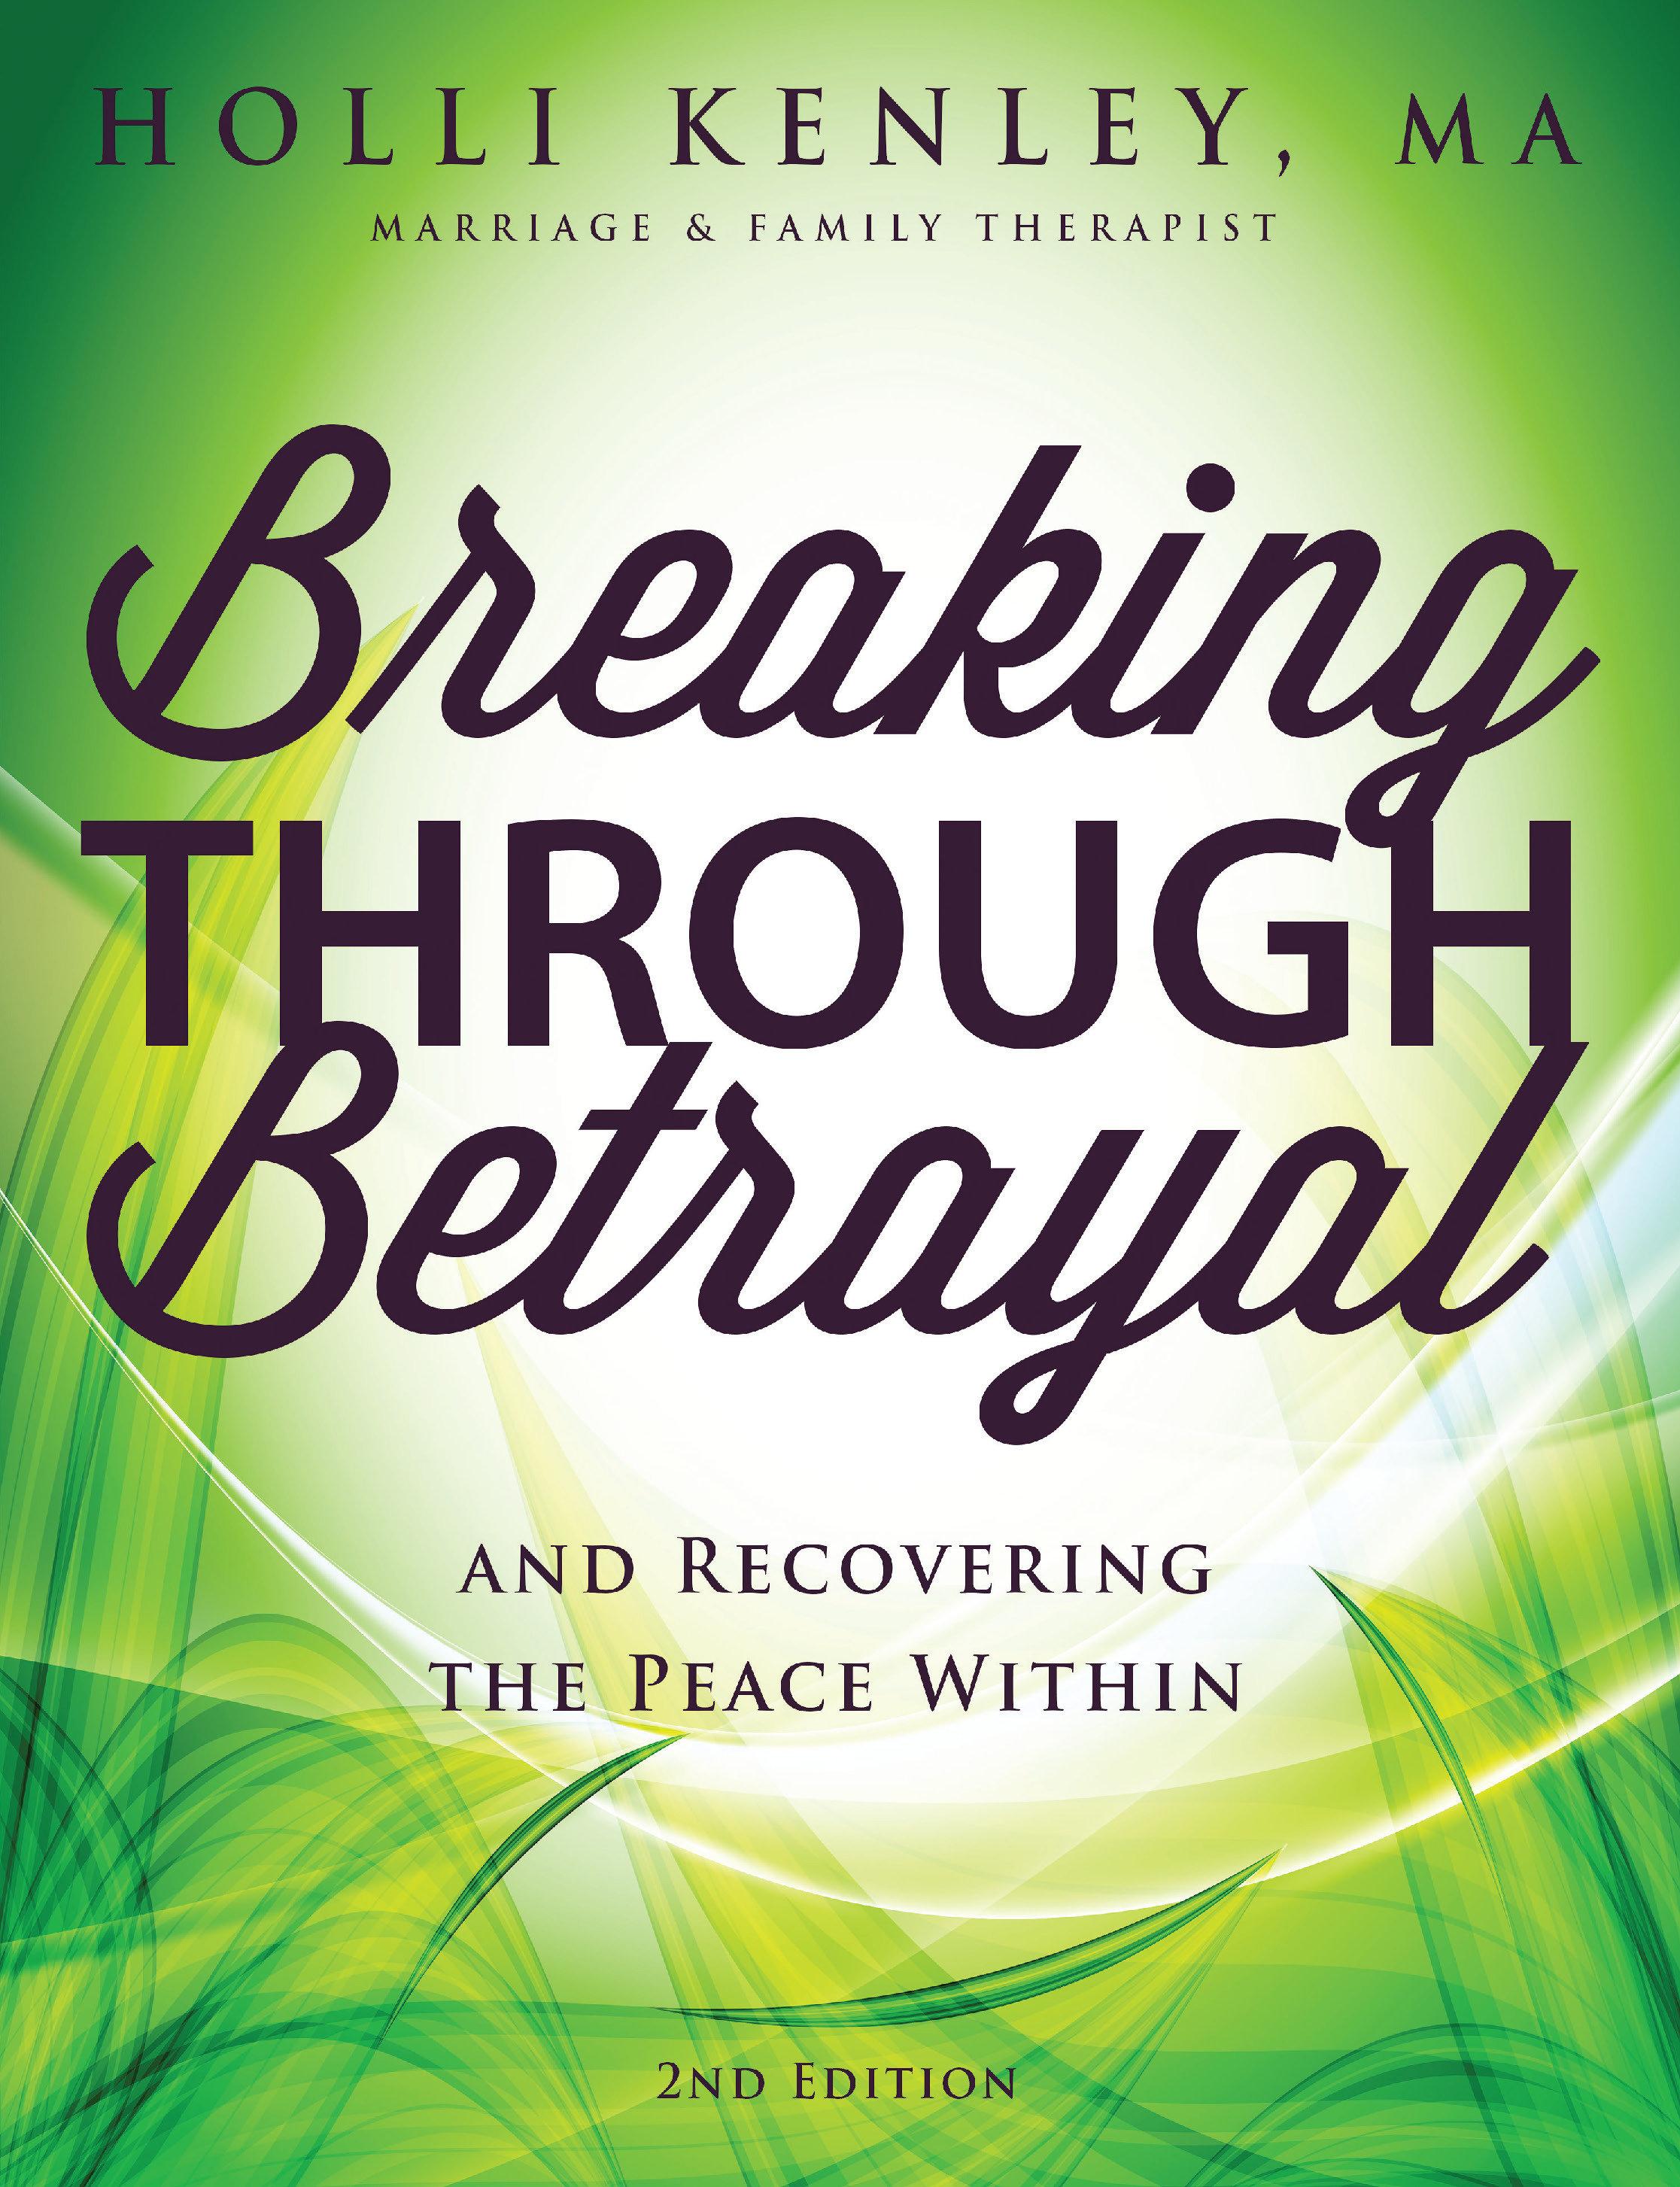 Breaking Through Betrayal, 2nd Ed. 978-1-61599-285-0